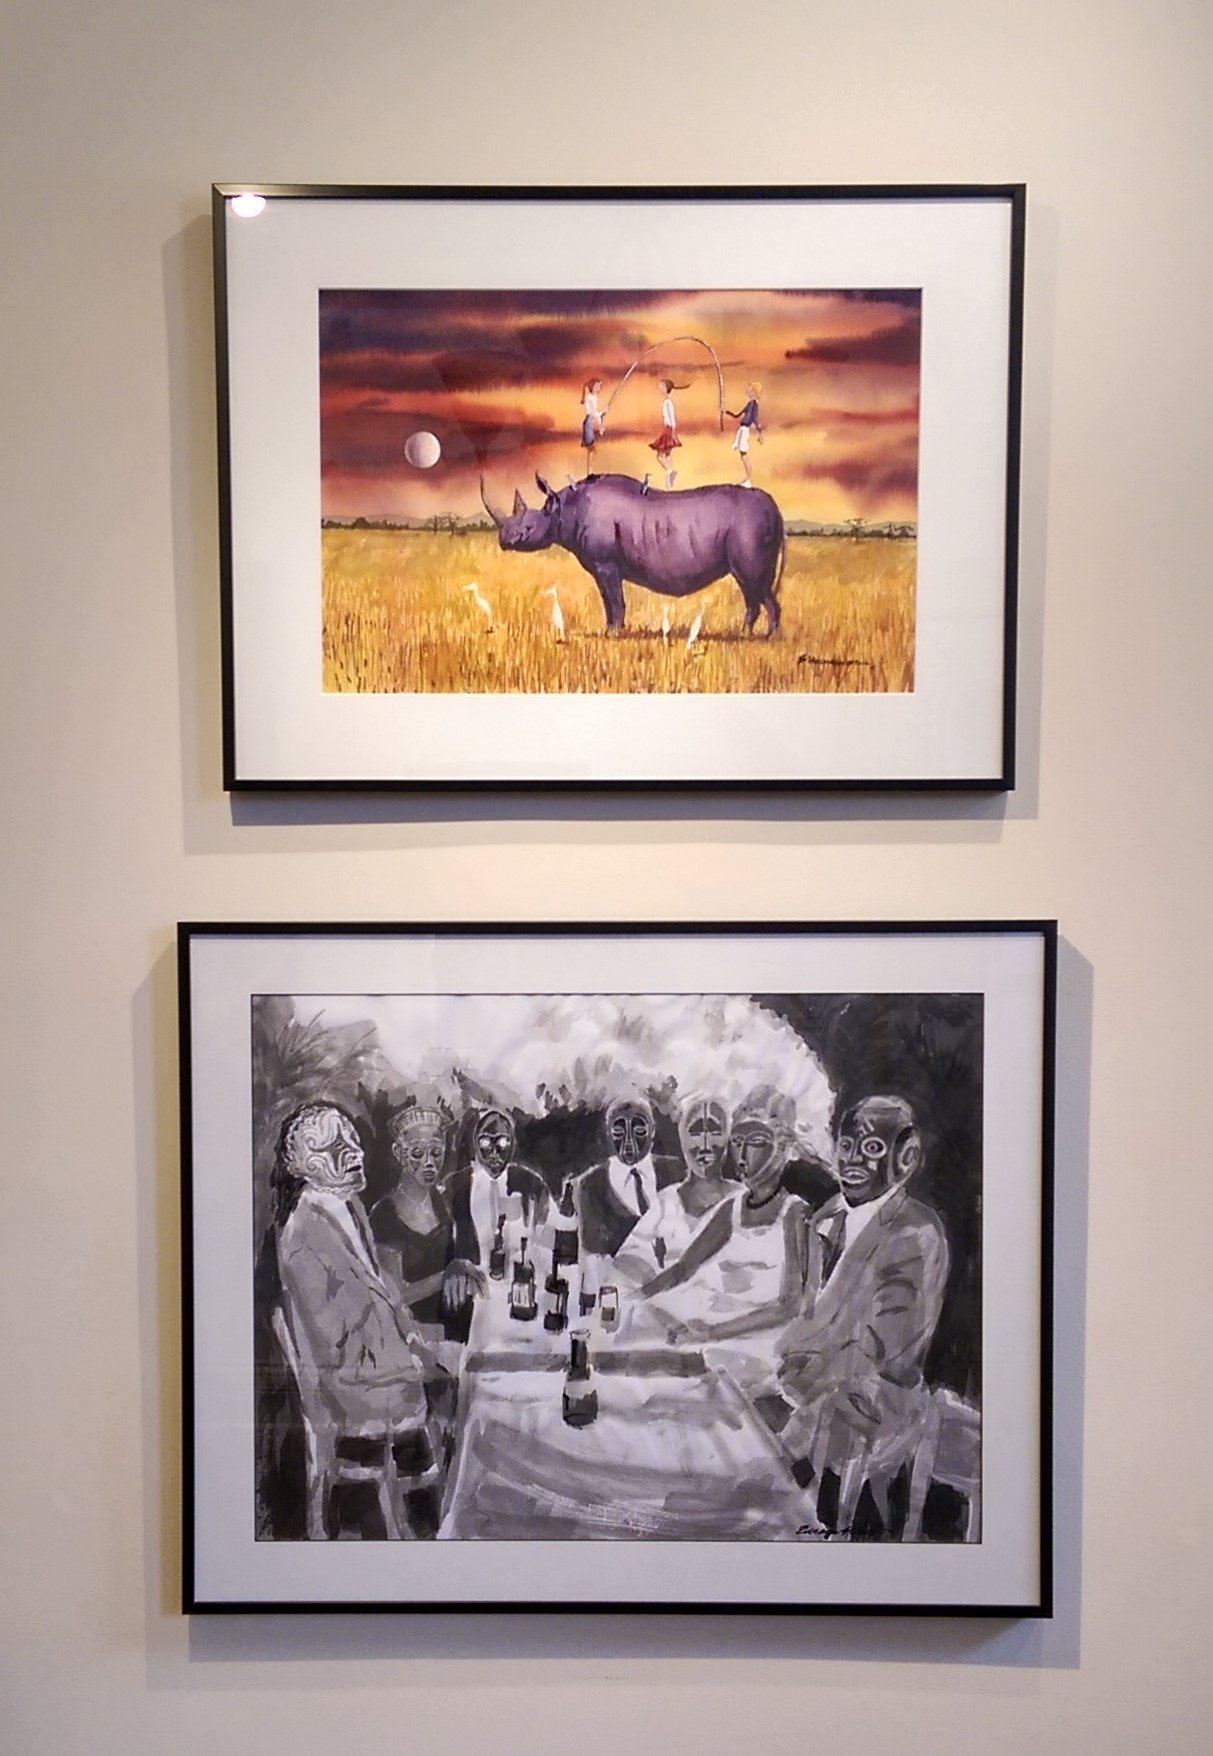 Hollingsworth-Preposterous Rhinoceros